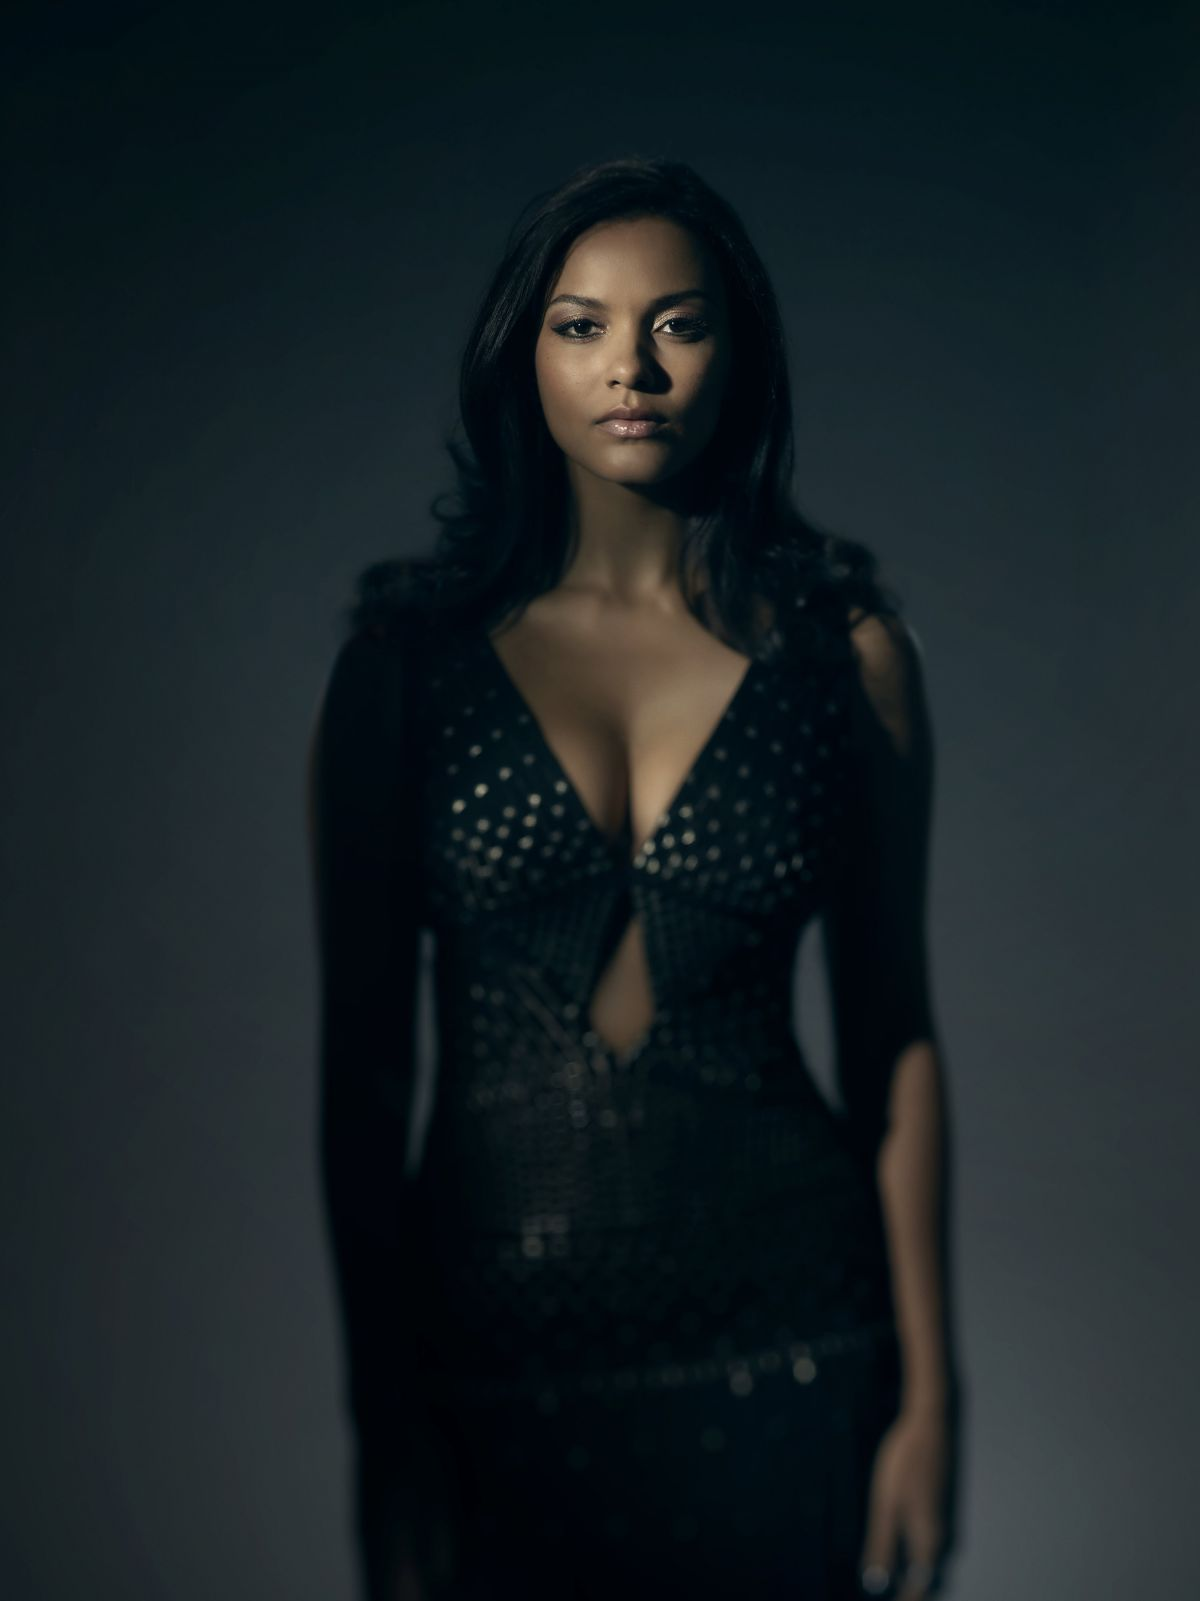 JESSICA LUCAS - Gotham, Season 3 Promo